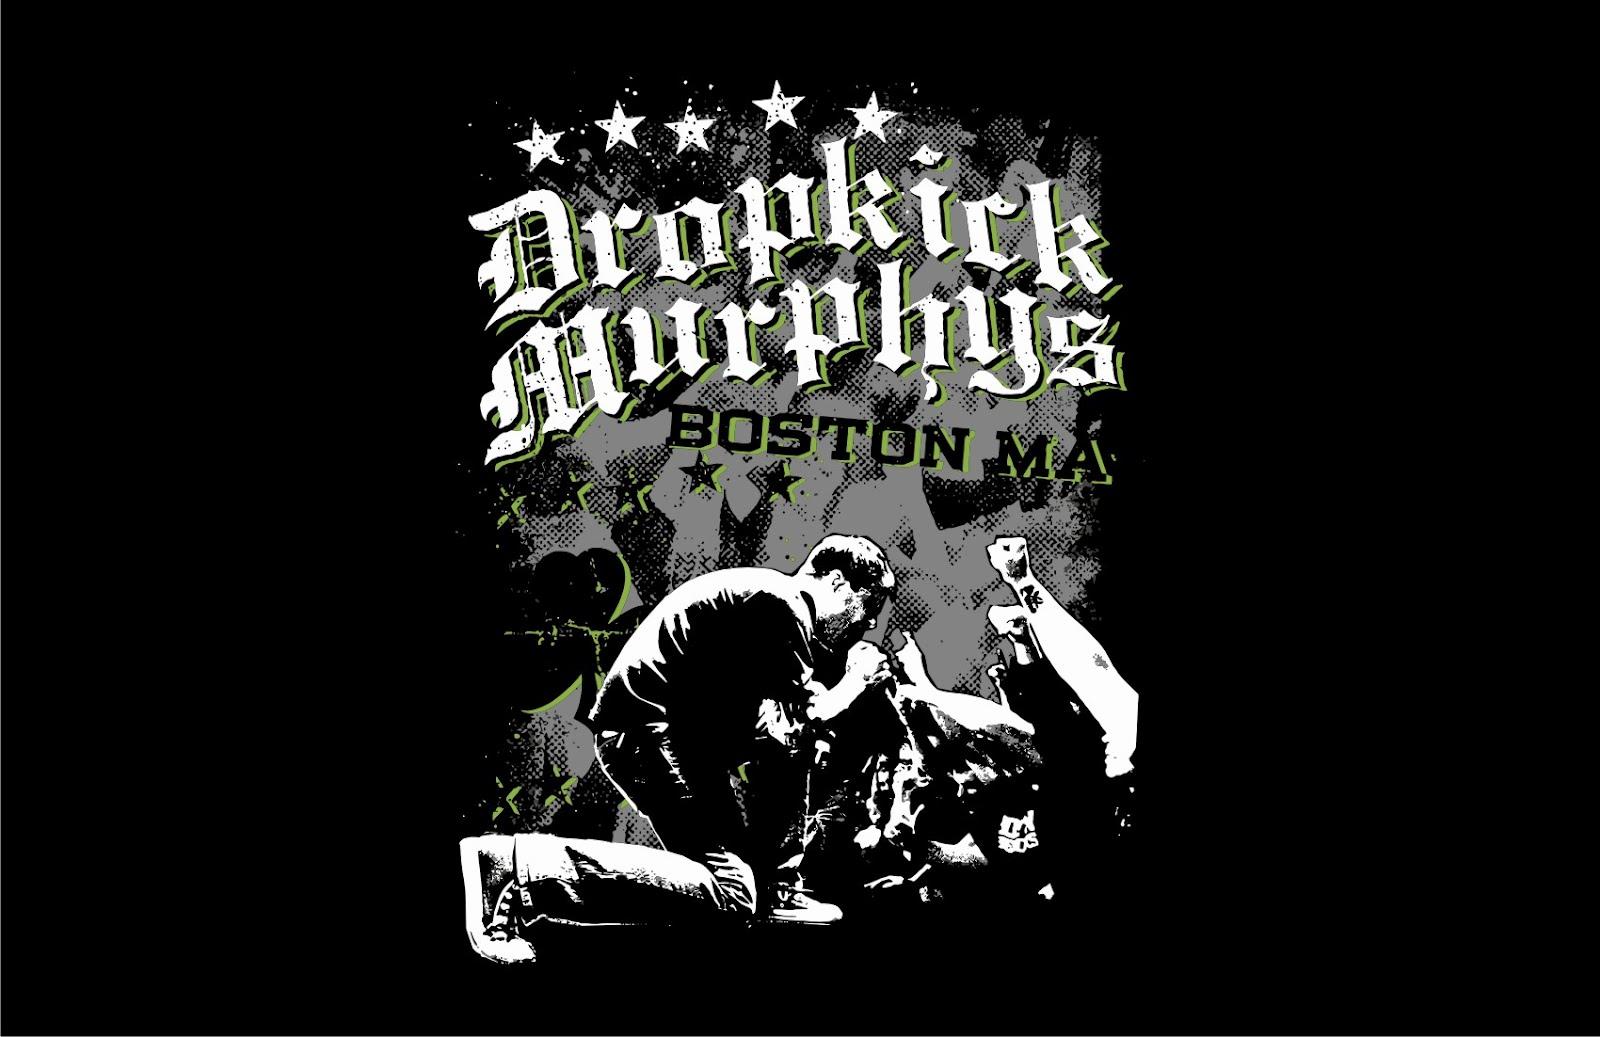 dropkick_murphys-boston_ma_front_vector